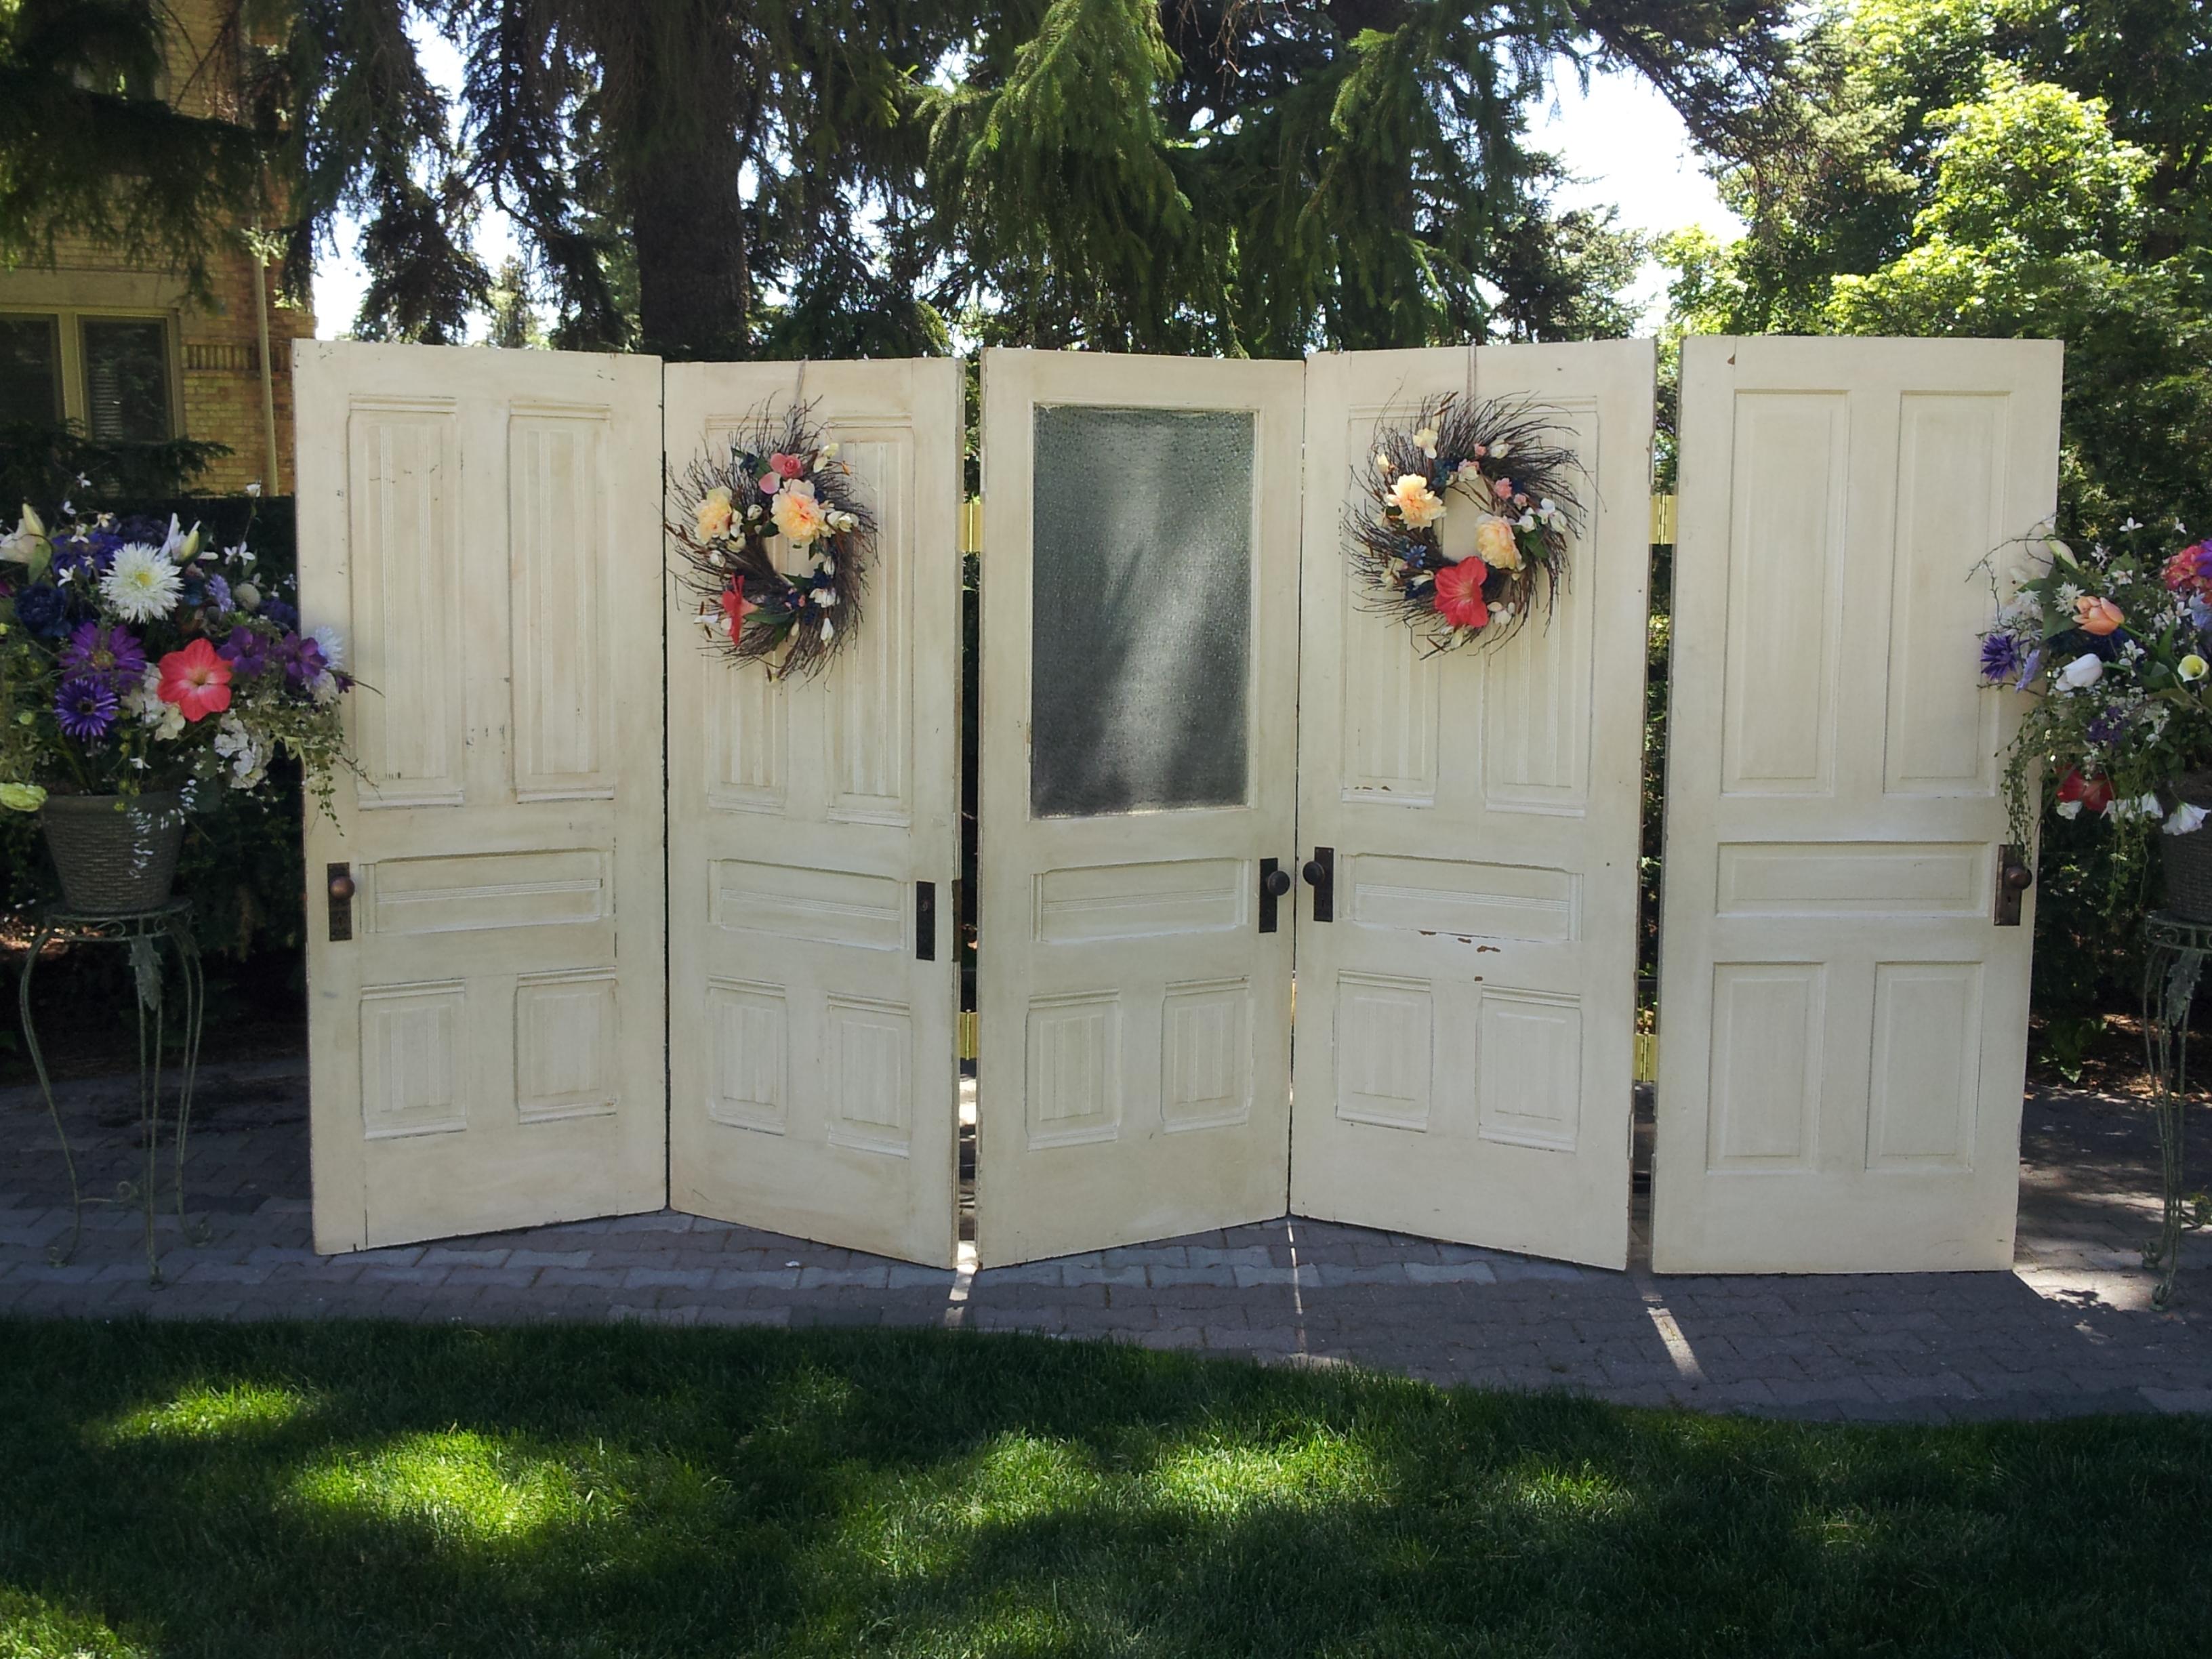 Vintage Doors Backdrop